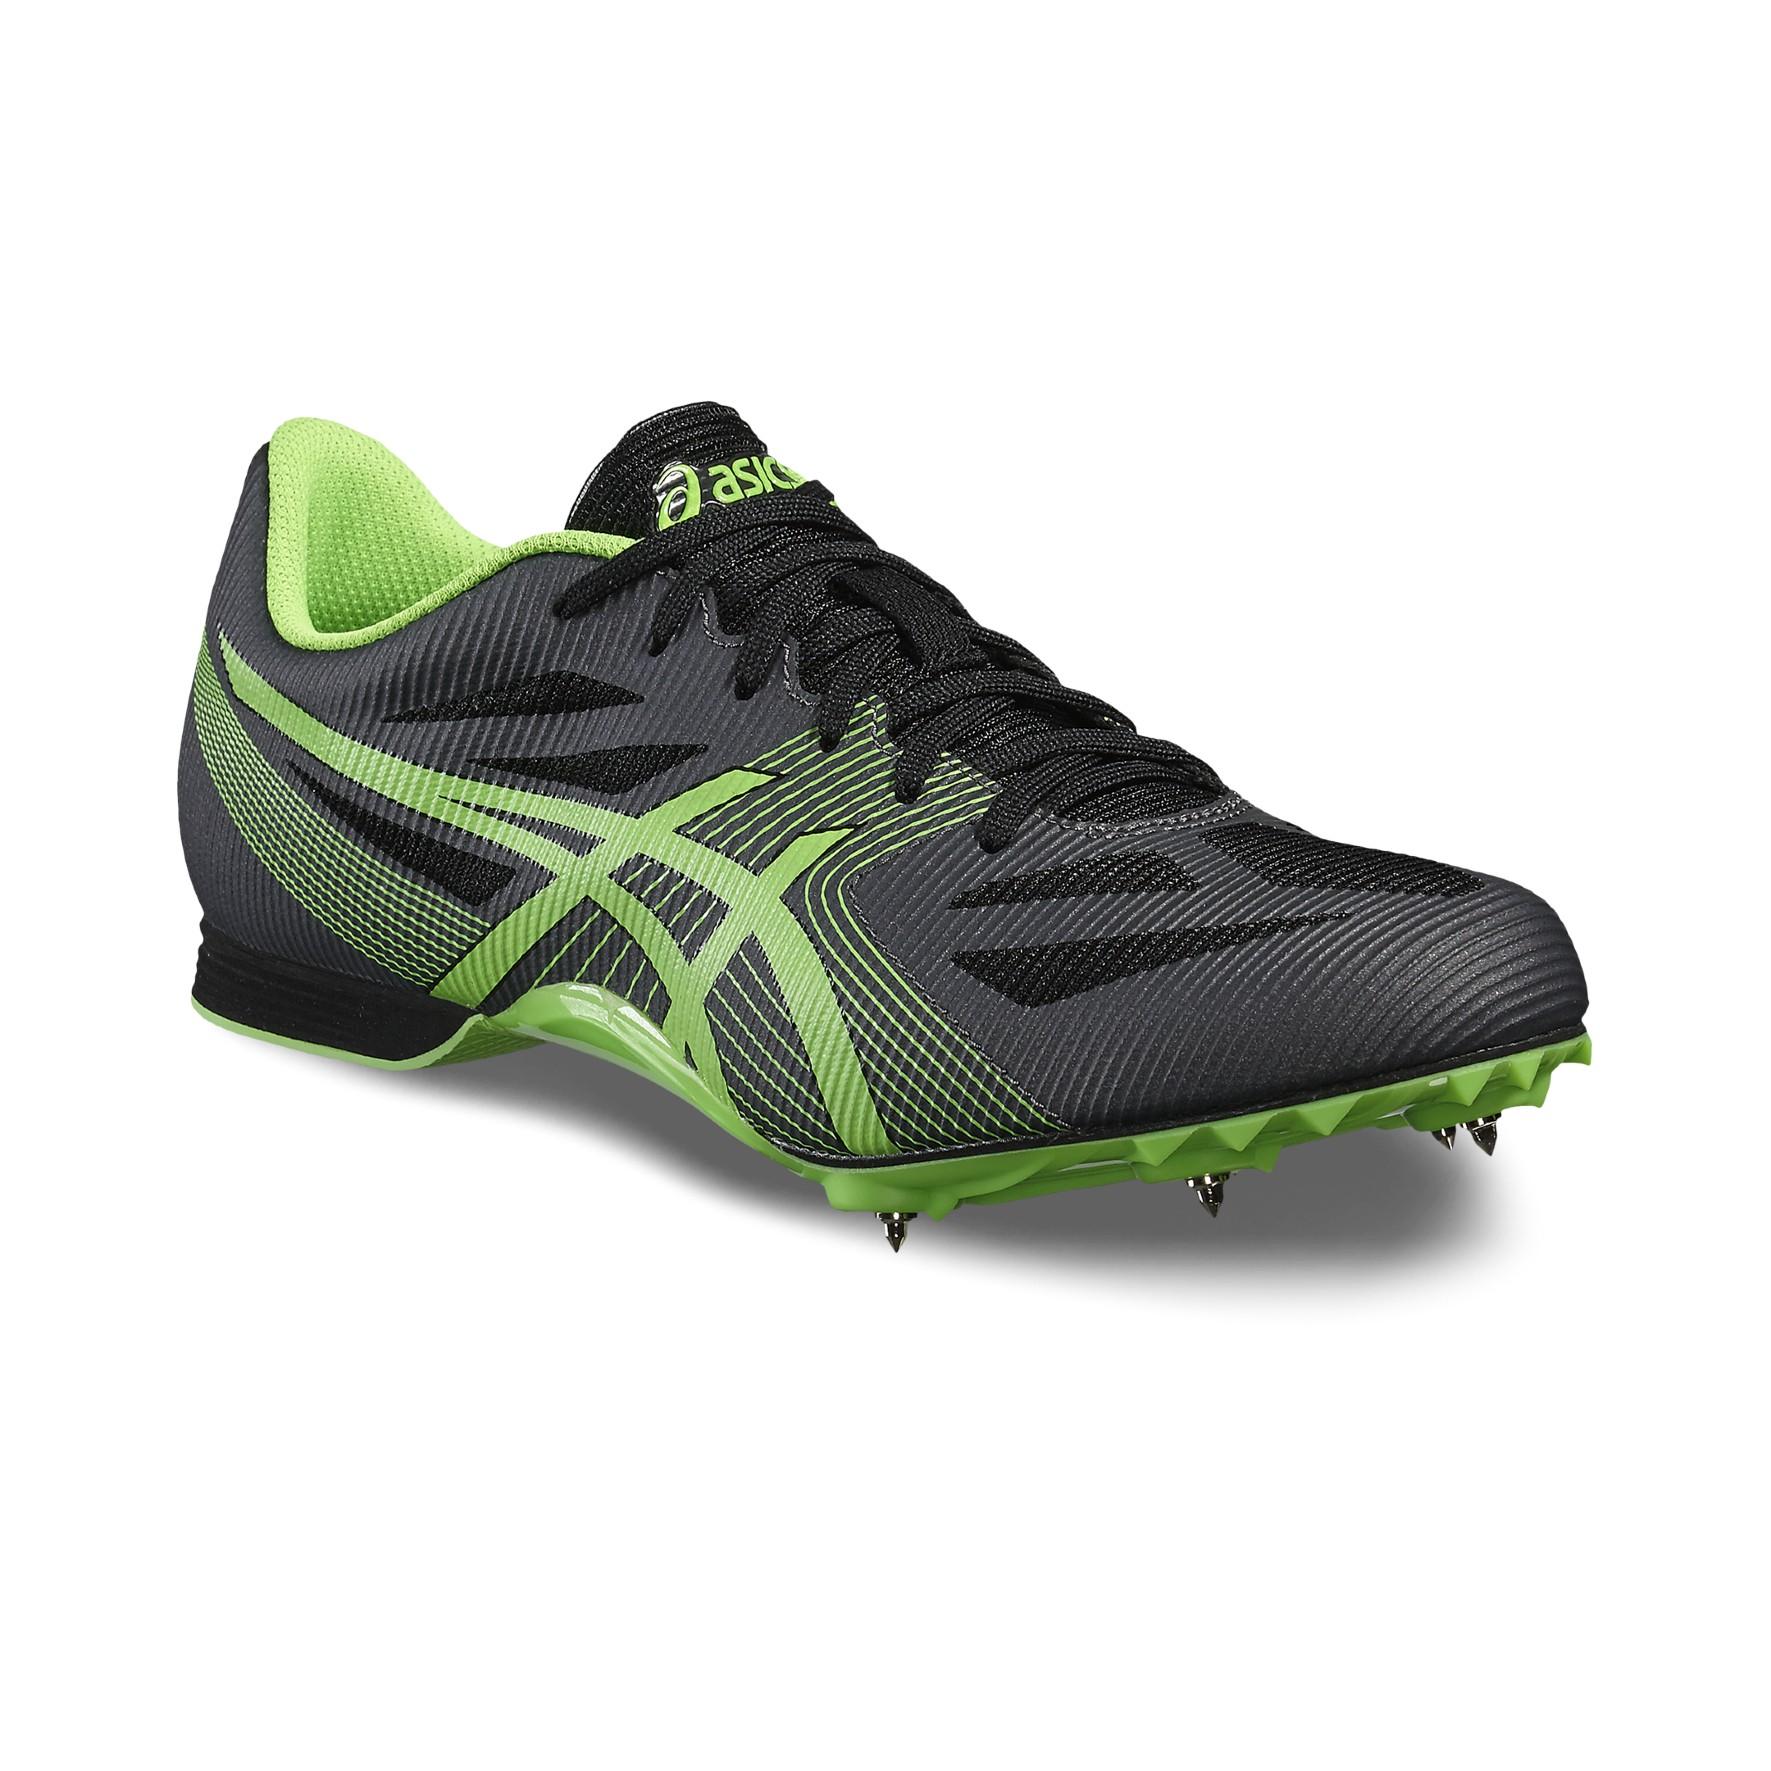 1fb2a6f228 6 Hyper Asics Md Schuhe Leichtathletik Dzwqnxu OXiPZku